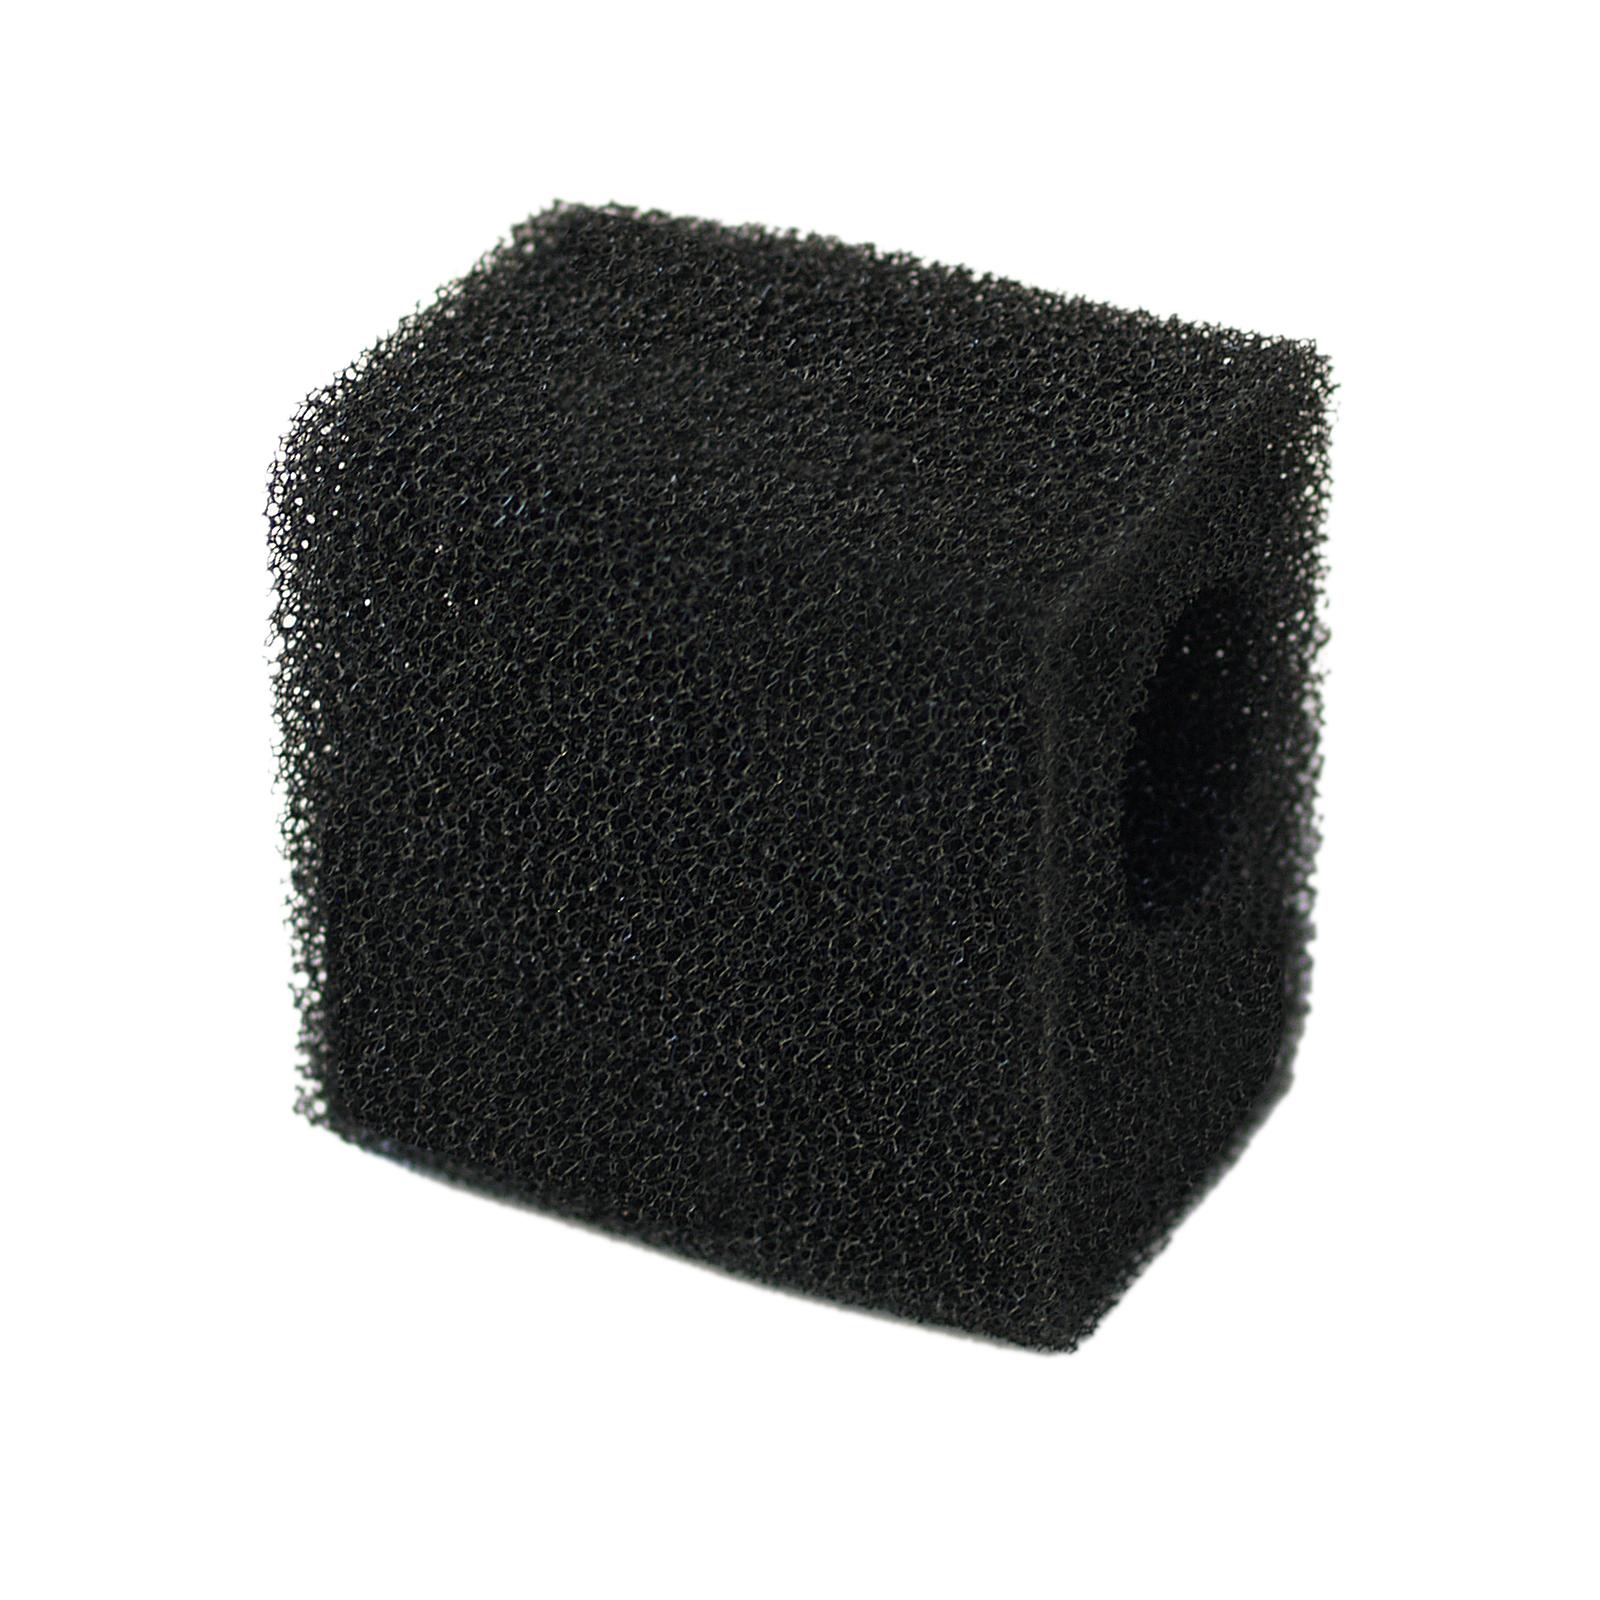 Ttsunsun chj 3003 spare part filter sponge for fountain for Pond pump filter sponge